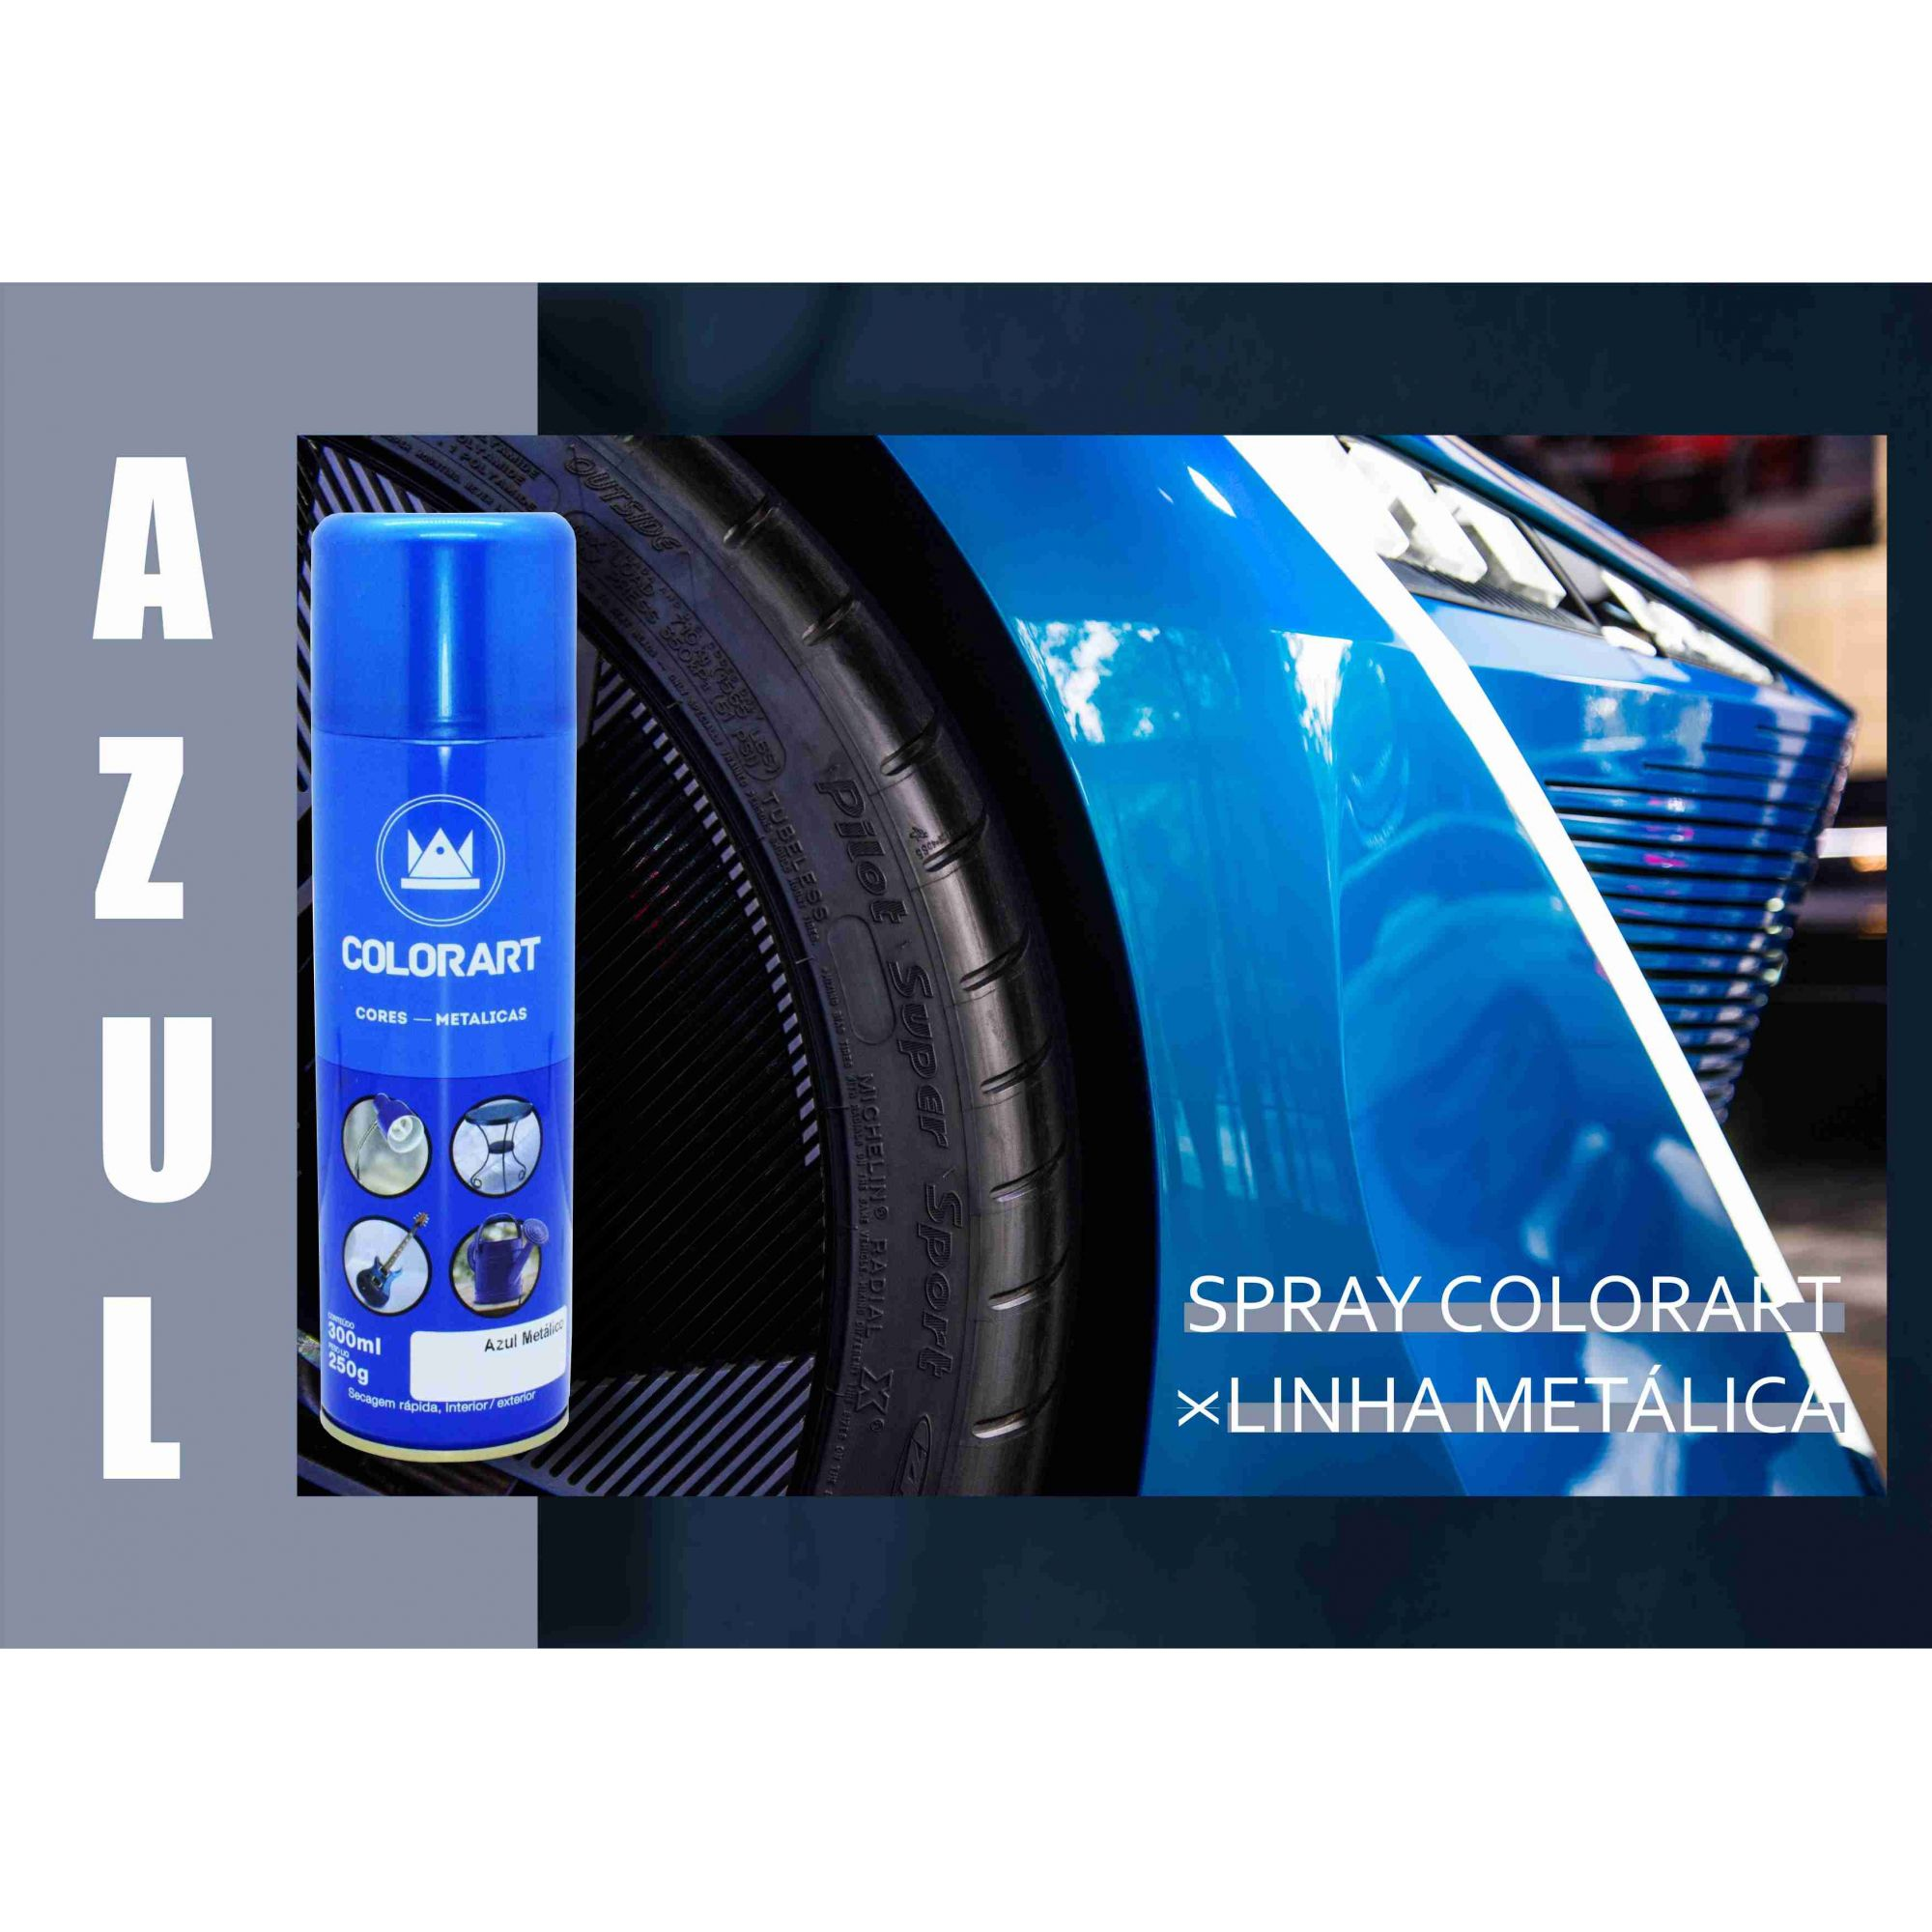 Tinta Spray Azul Metálico ColorArt  - Rea Comércio - Sua Loja Completa!